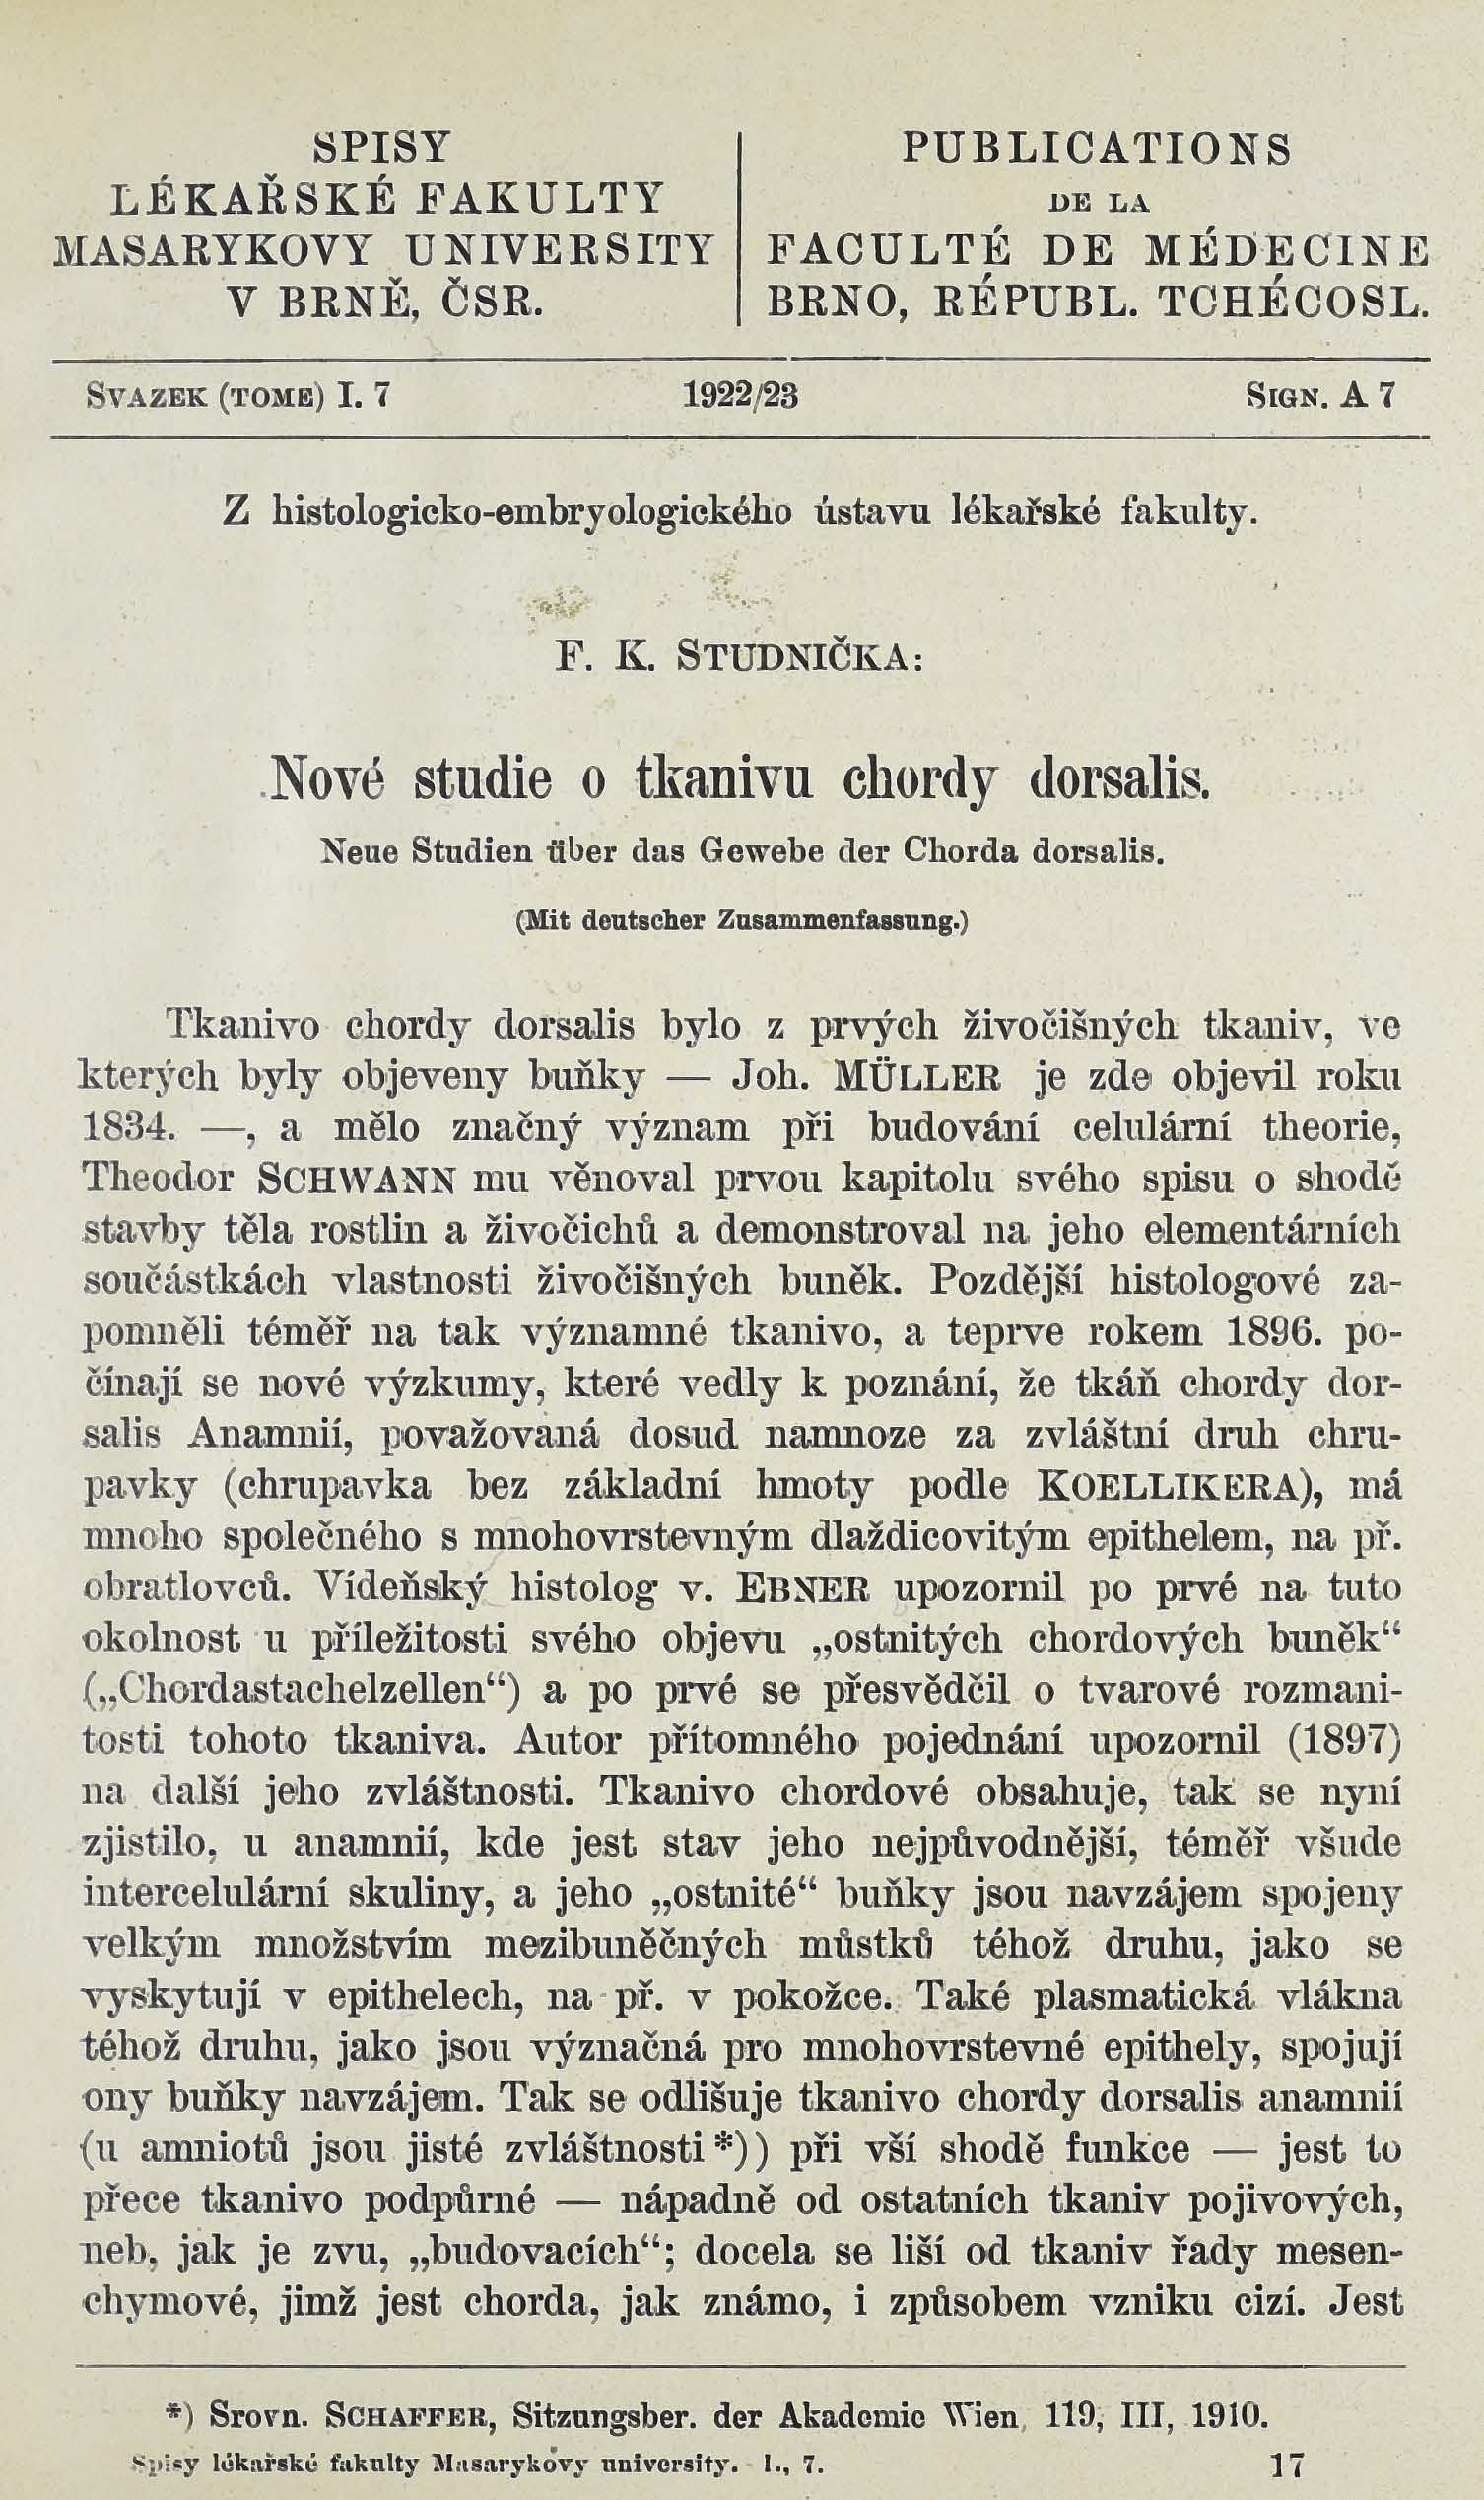 Obálka pro Nové studie o tkanivu Chordy dorsalis / Neue Studien über das Gewerbe der Chorda dorsalis